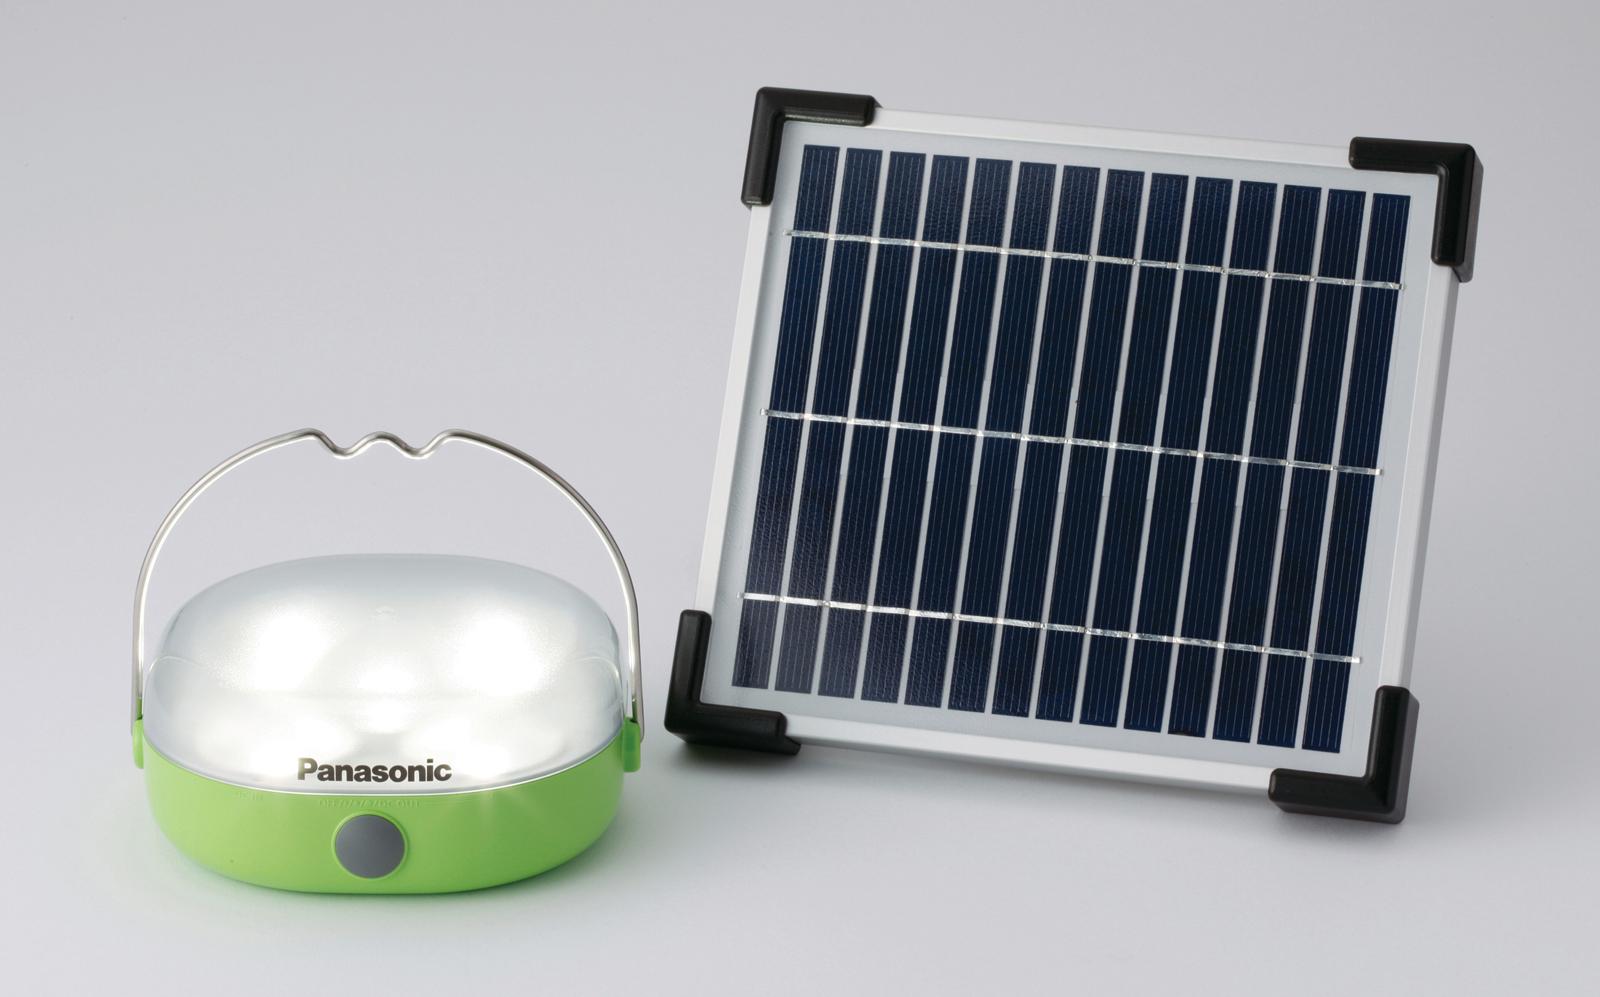 News] Panasonic to Release New Solar LED Lantern   100 THOUSAND ... for emergency lamp panasonic  56mzq